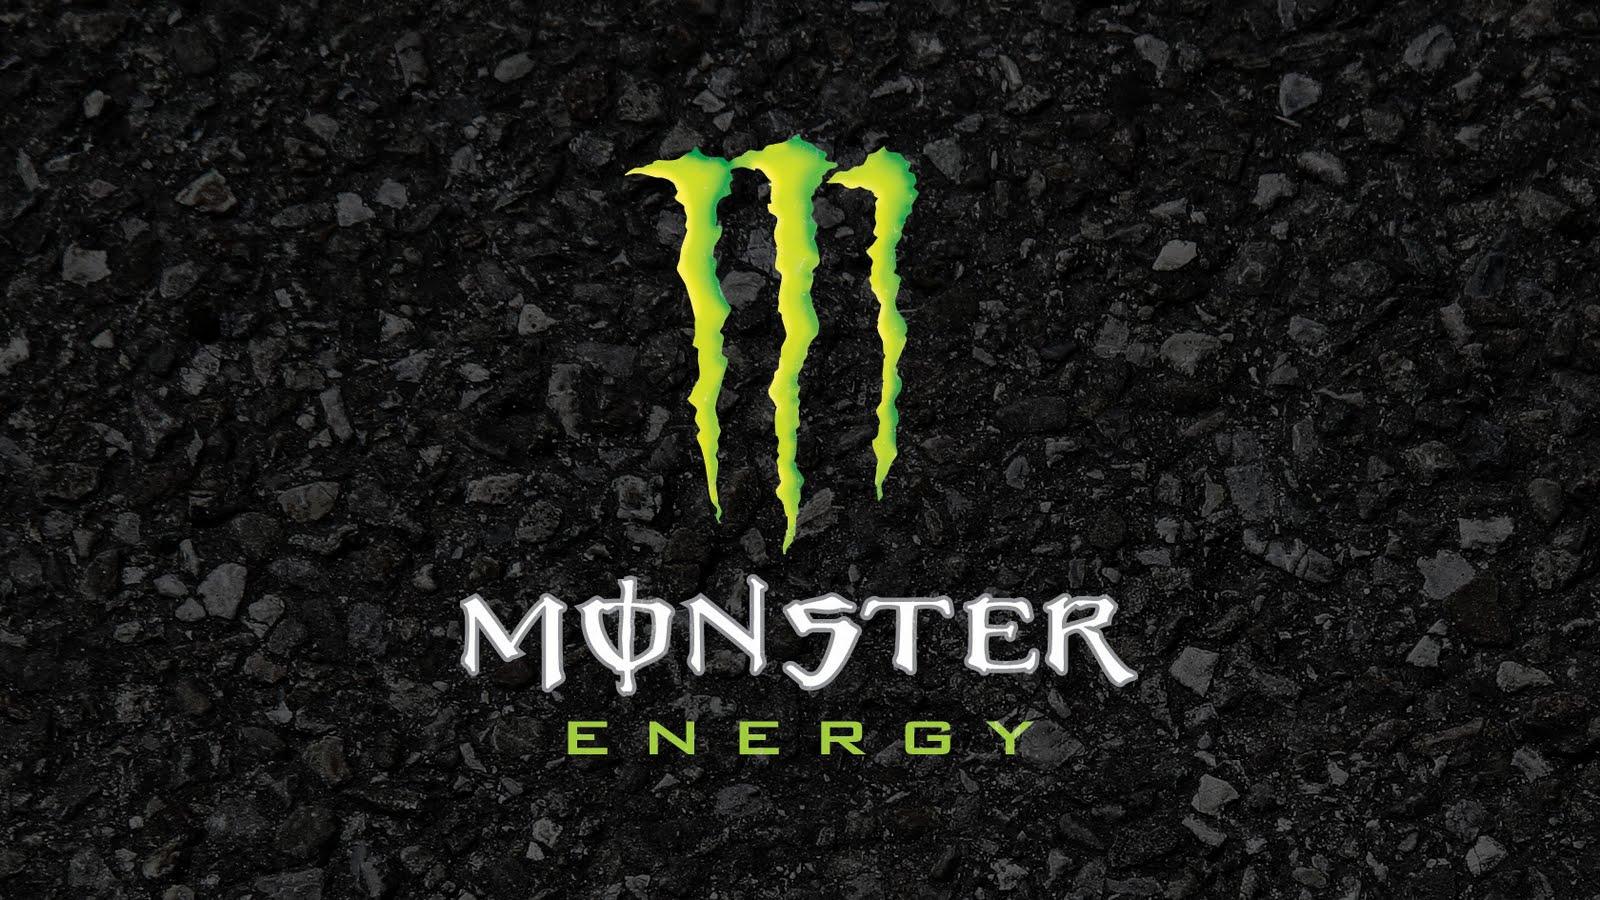 Monster energy wallpaper - Monster energy wallpaper download ...